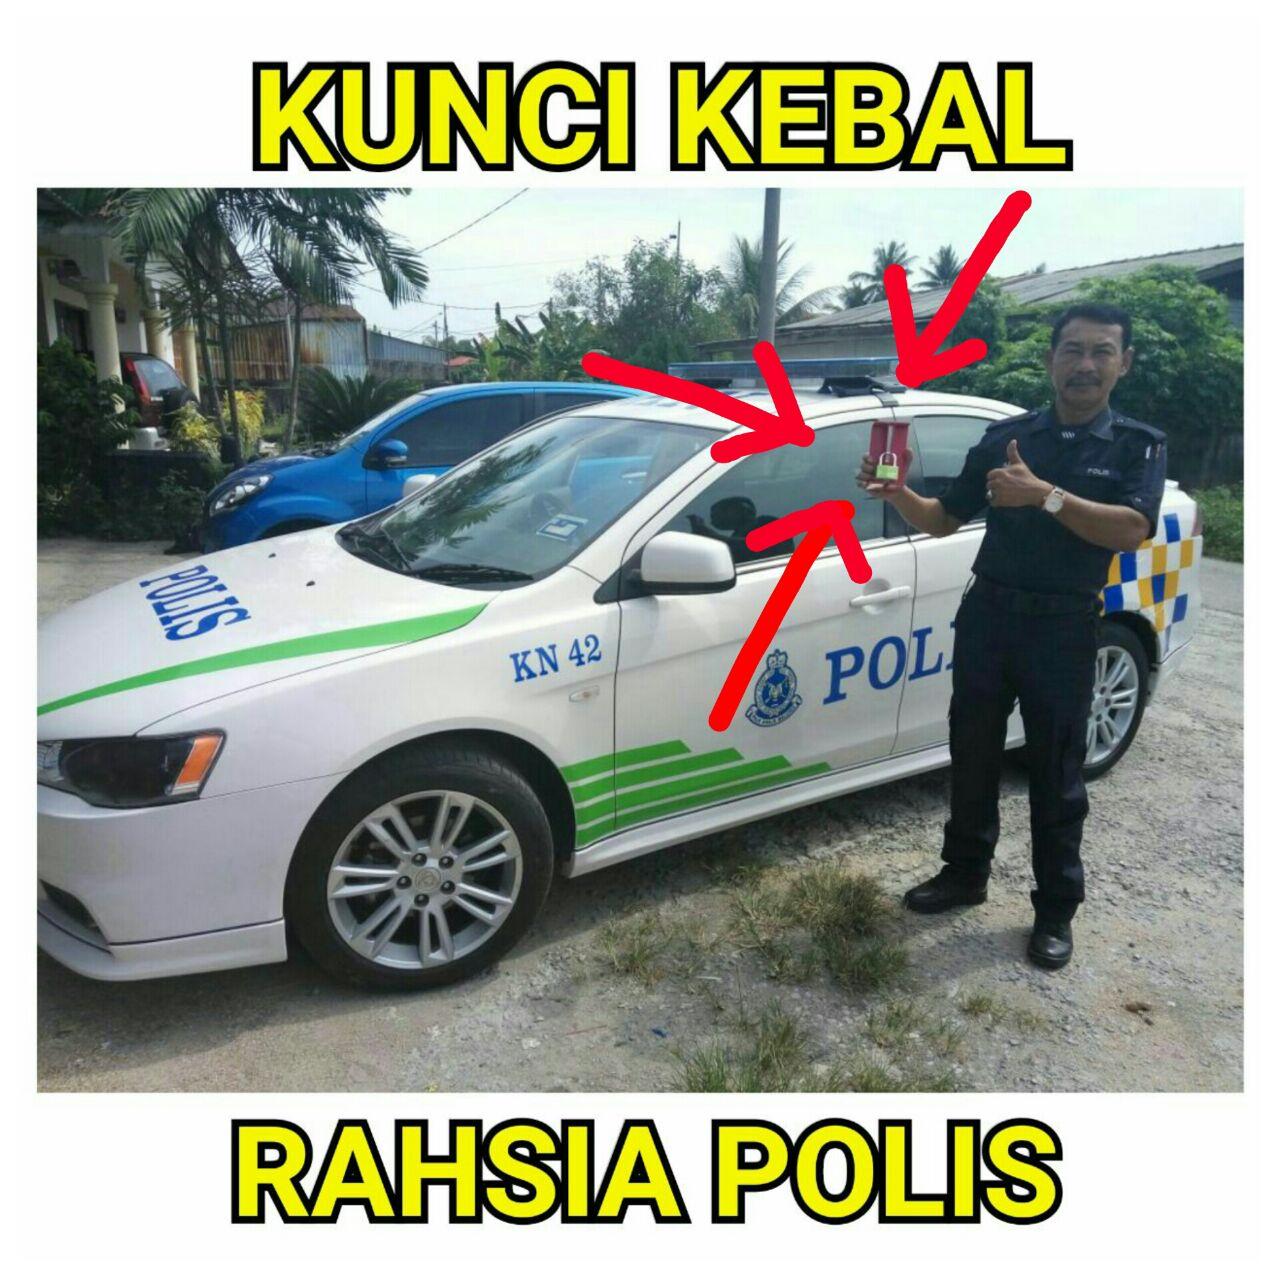 kunci kebal polis guna